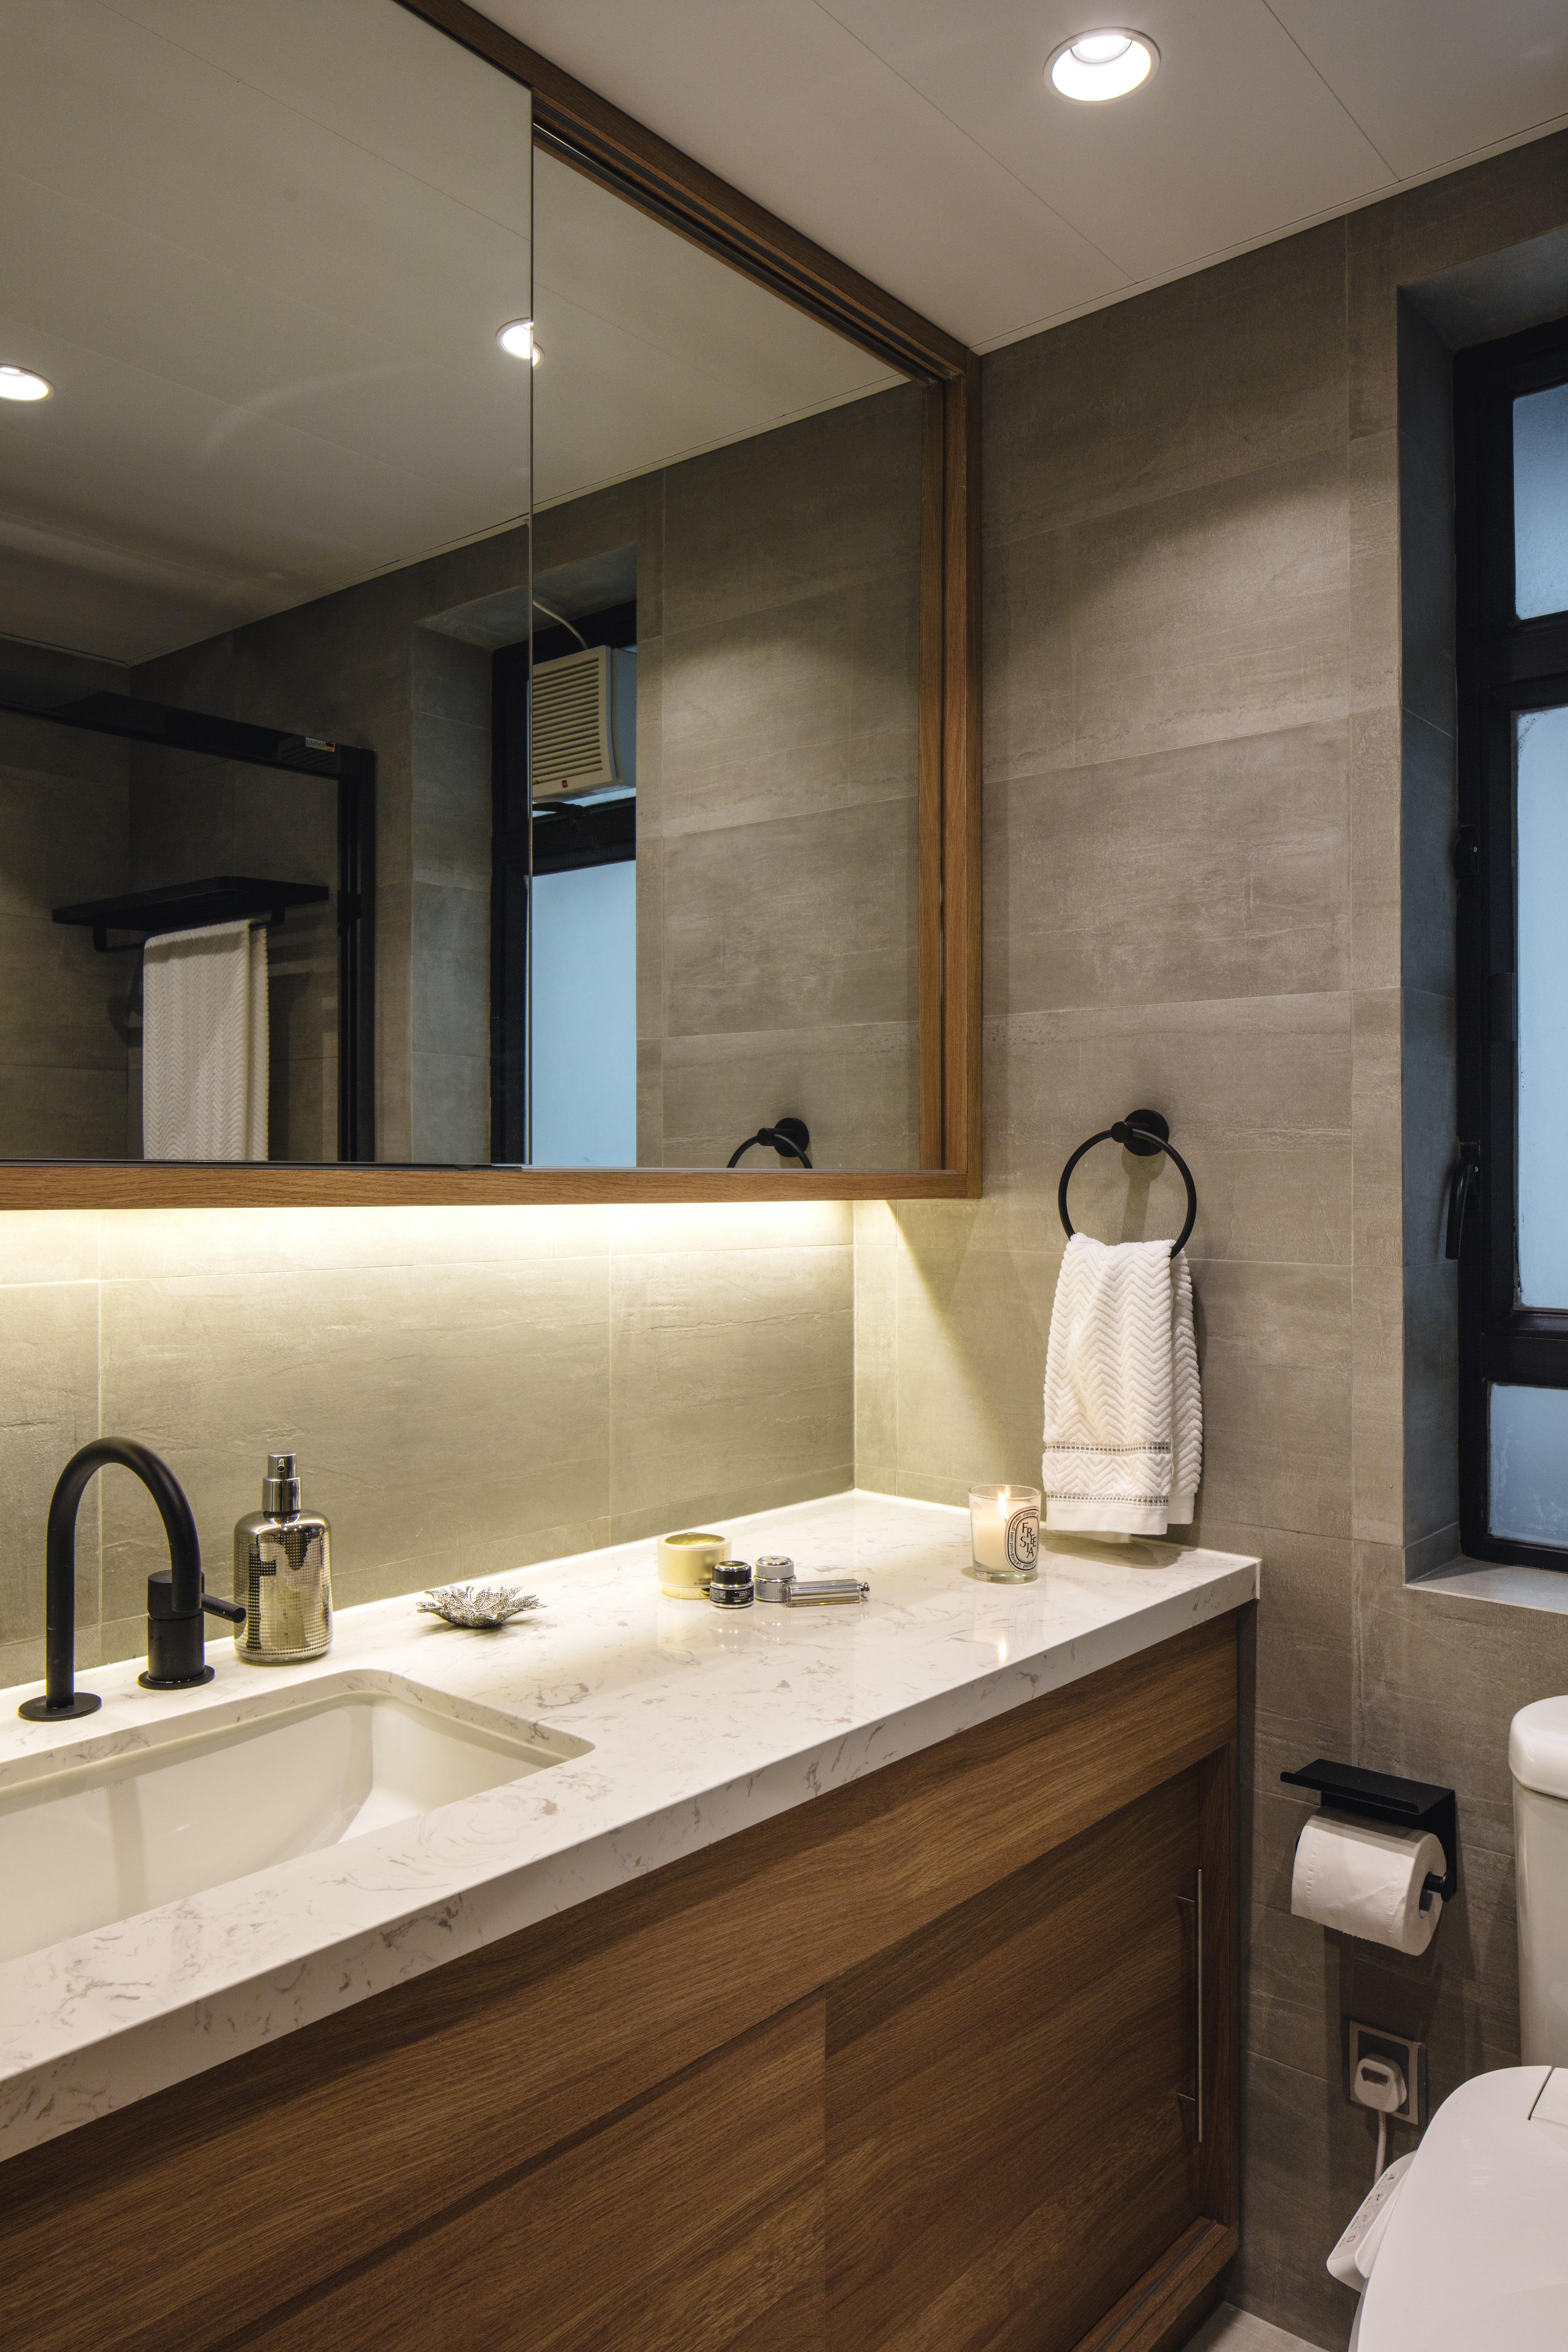 Luxurious Details Such As The Matt Black Taps And Rain Shower Elevate The  Apartmentu0027s Interior Design.